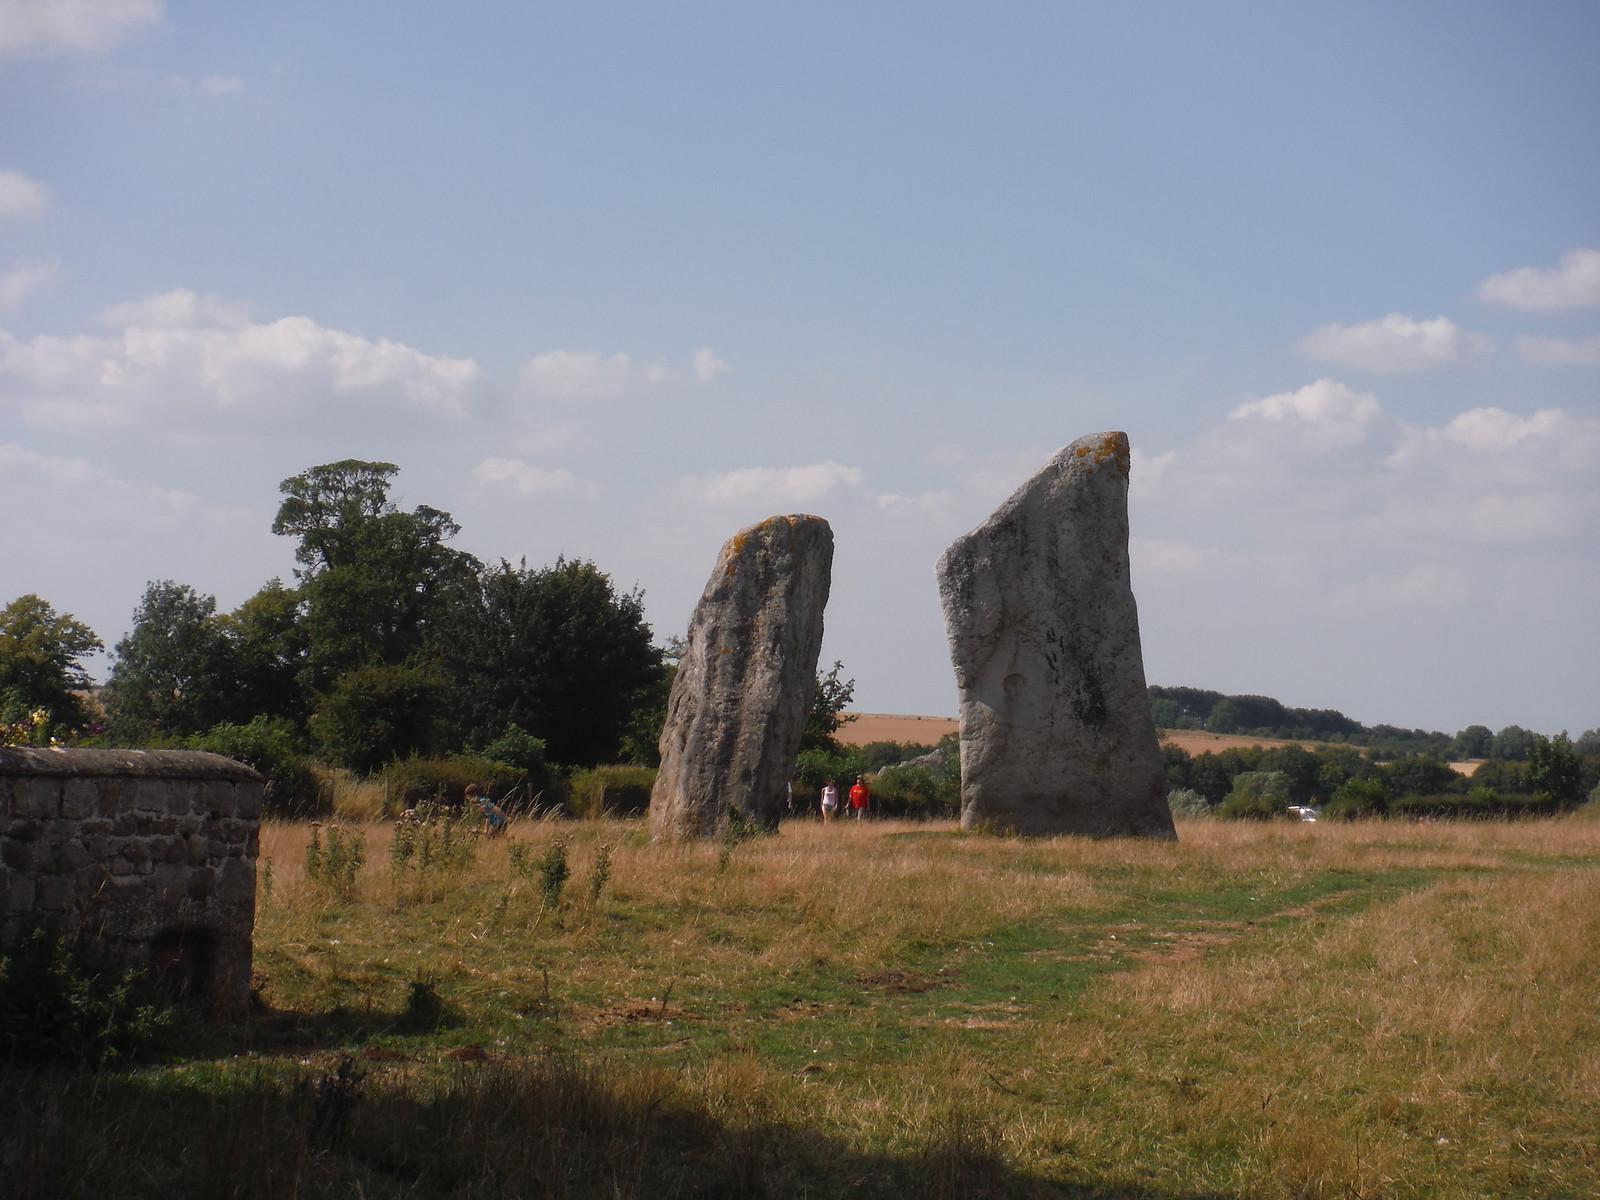 Avebury Standing Stones, NE quartile SWC Walk 255 Pewsey or Marlborough Circular via Avebury